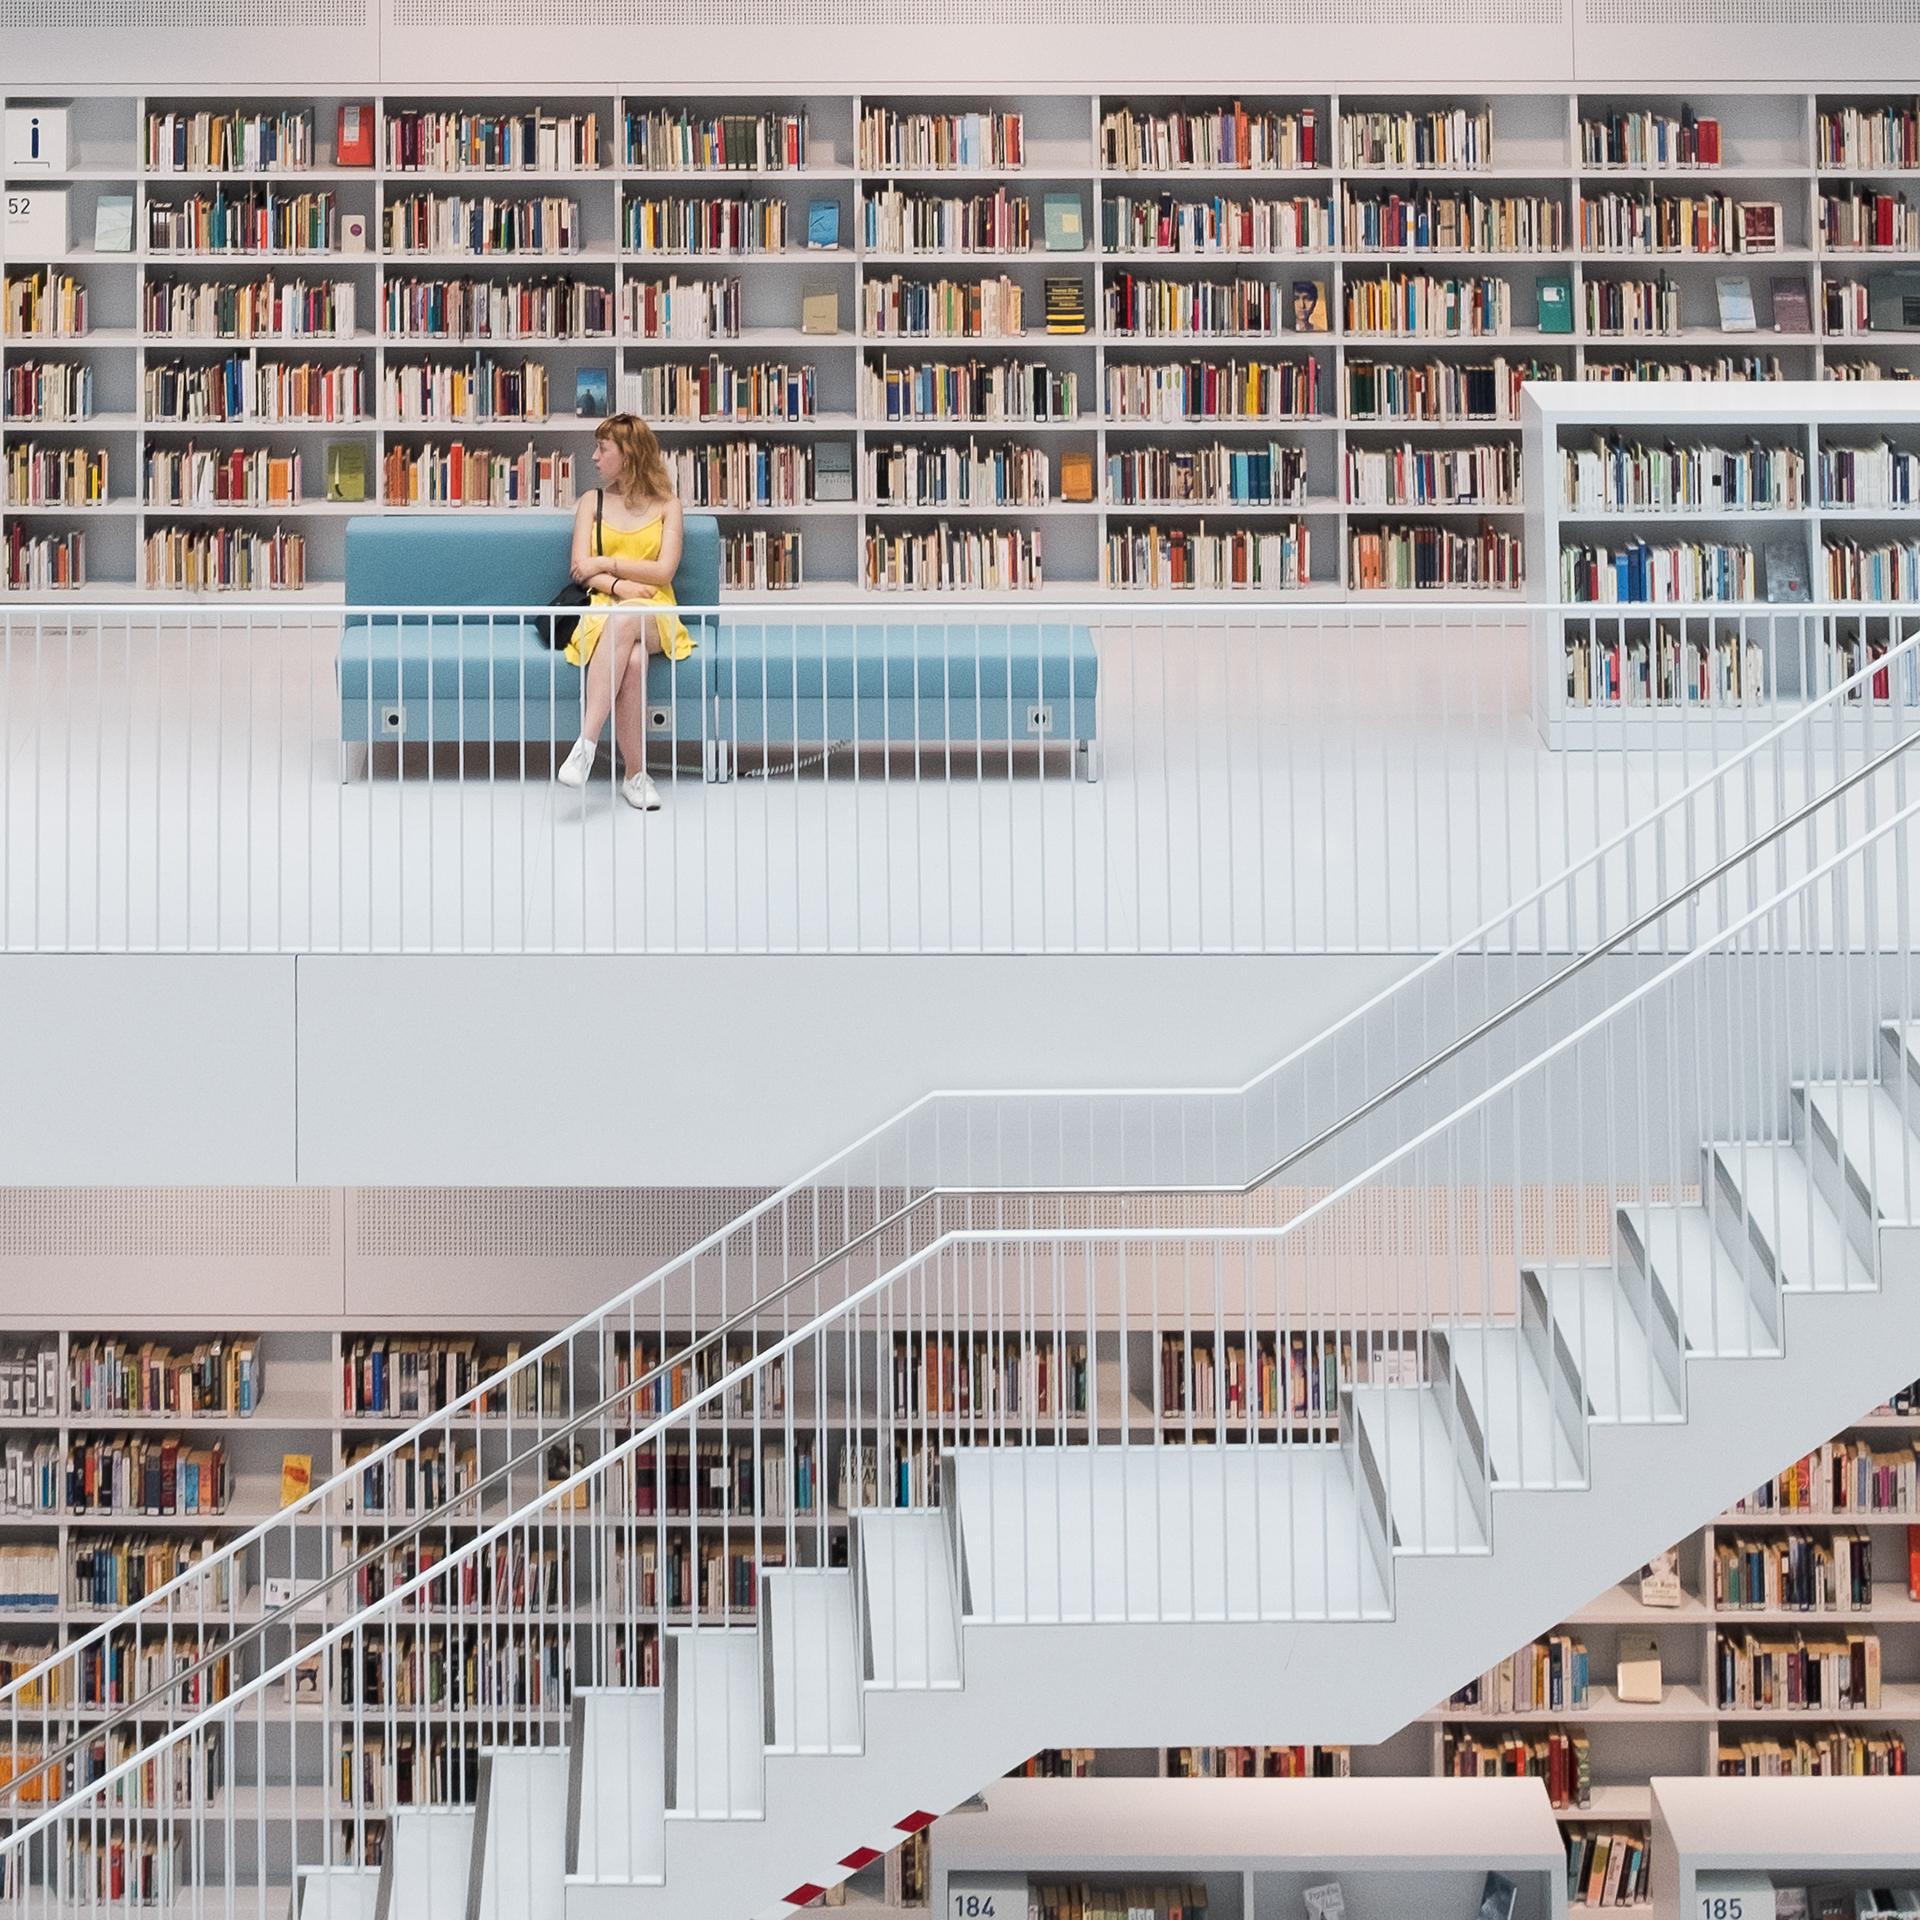 Peaceful Library in Stuttgart by Skander Khlif